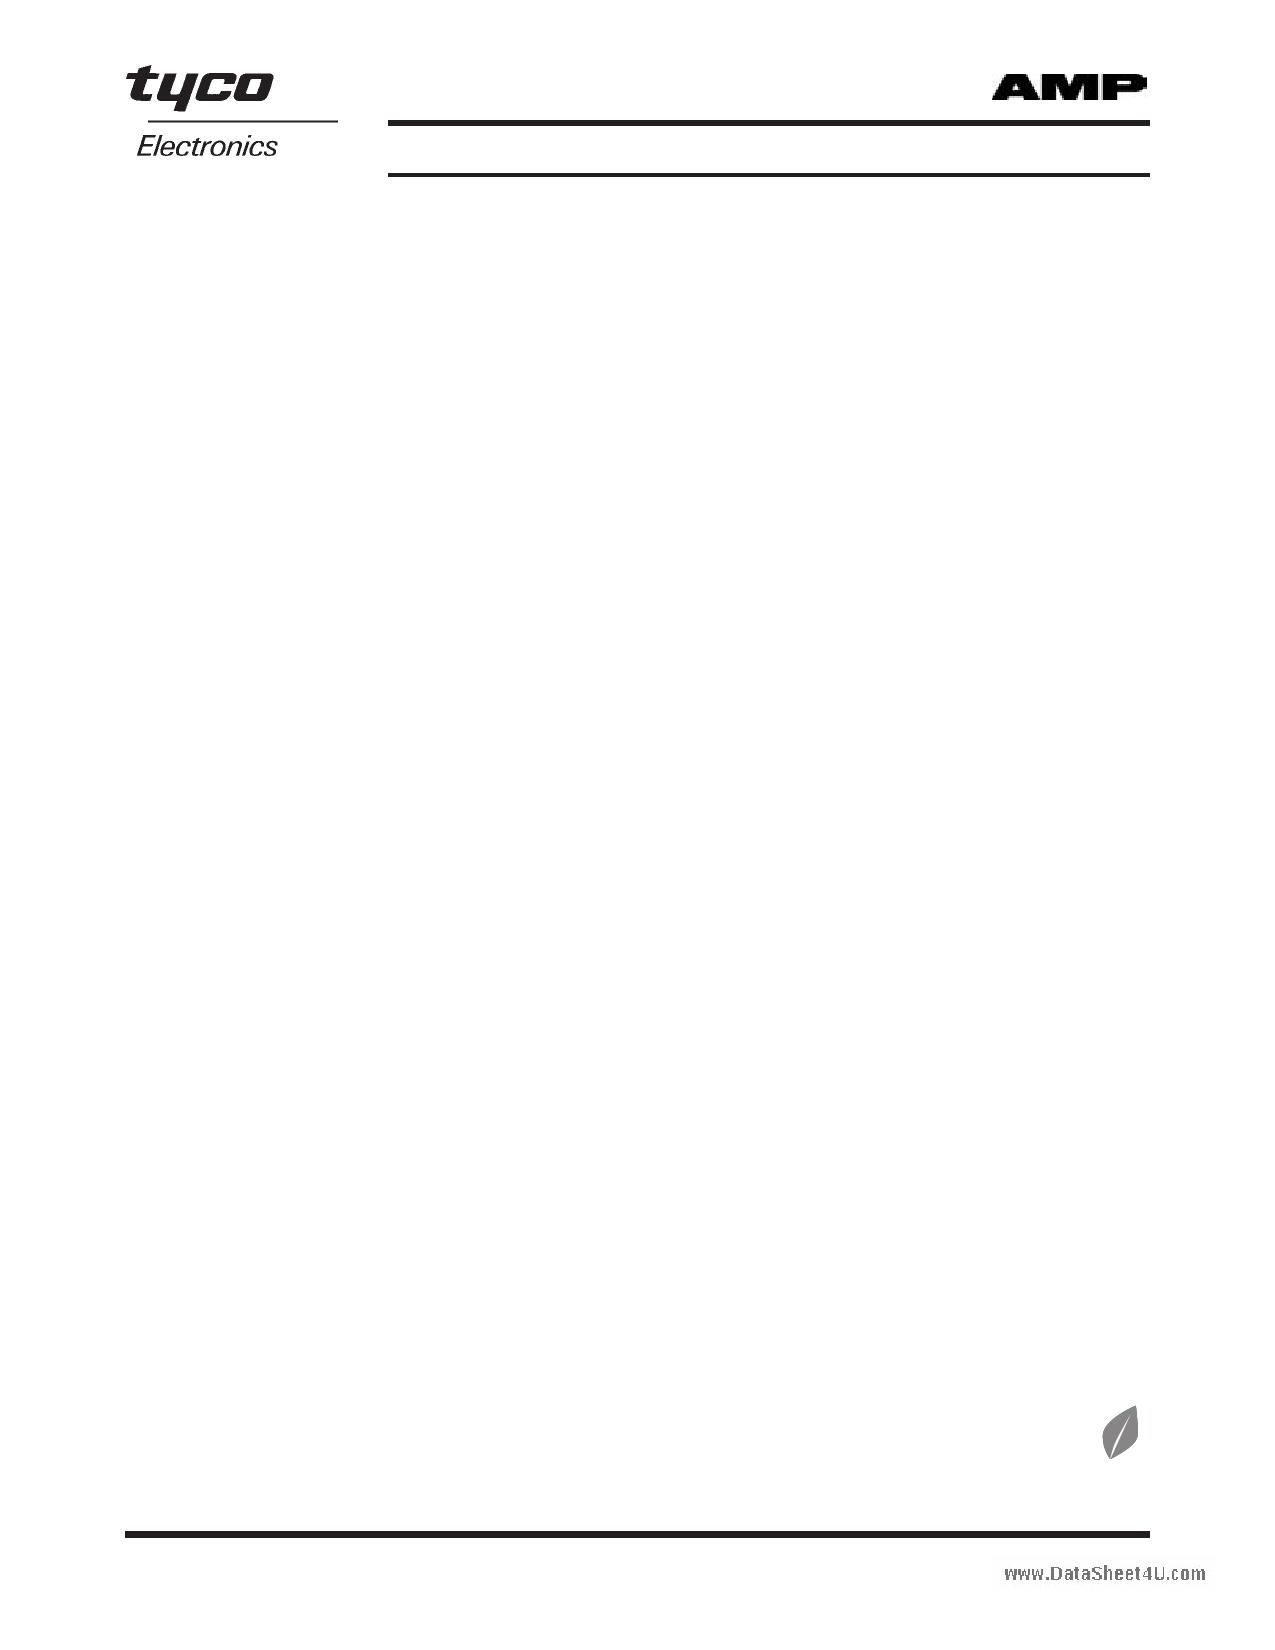 1-5316318-x pdf, arduino